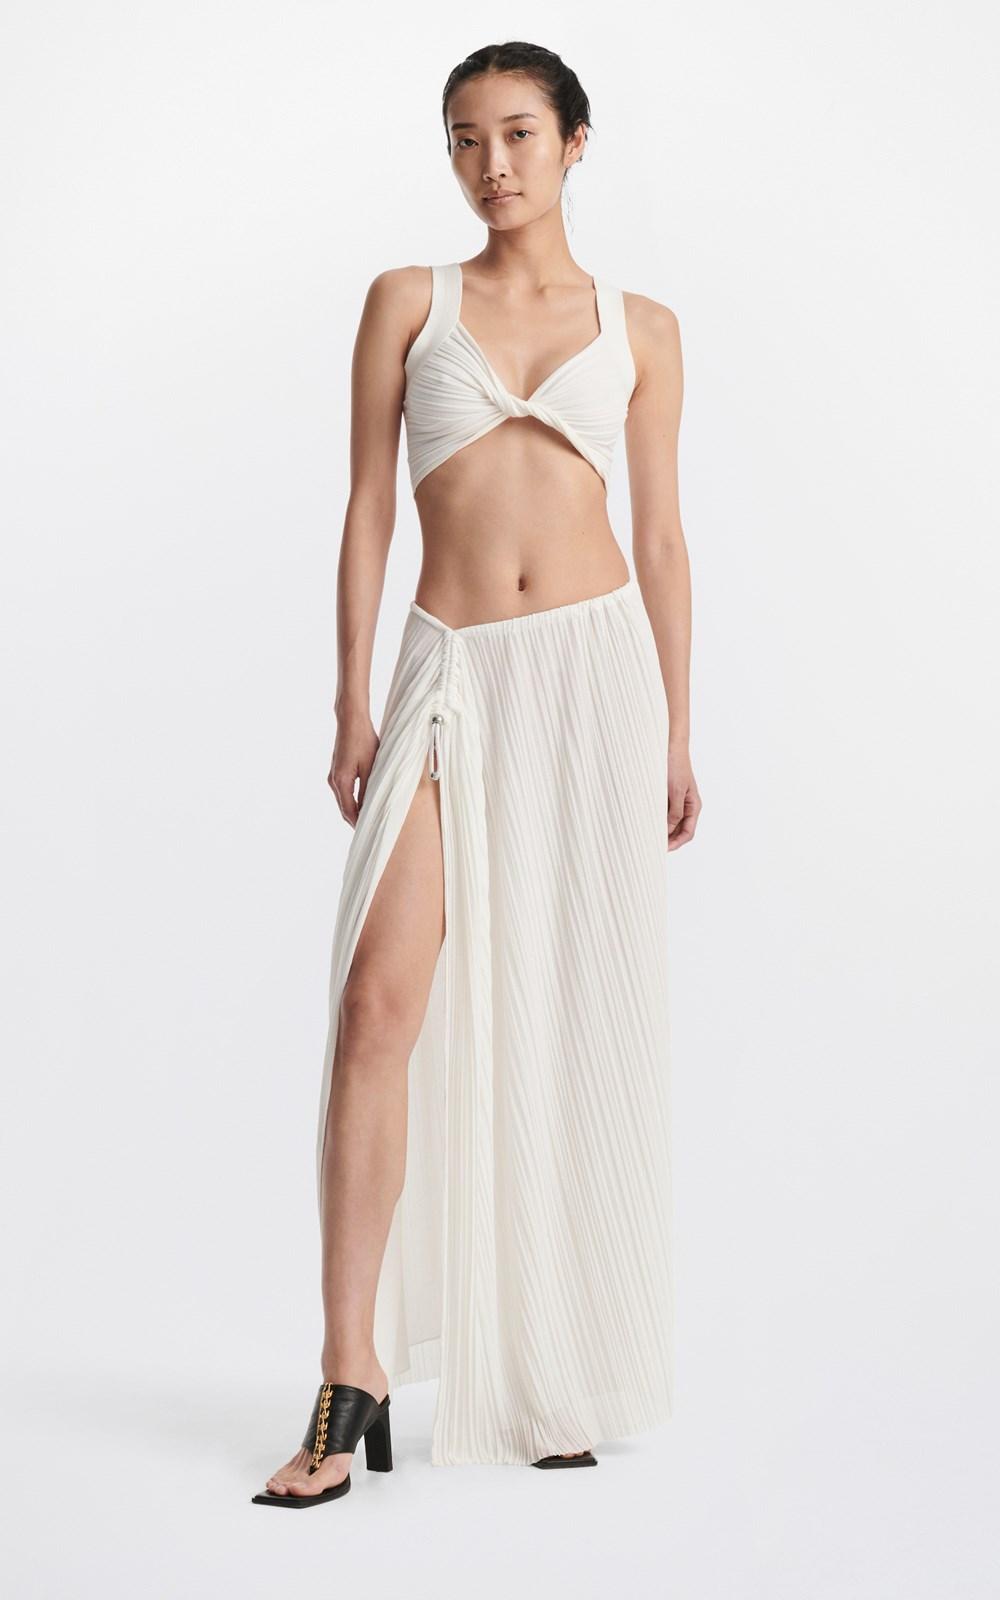 Skirts | PLEATED BEAD GATHER SKIRT